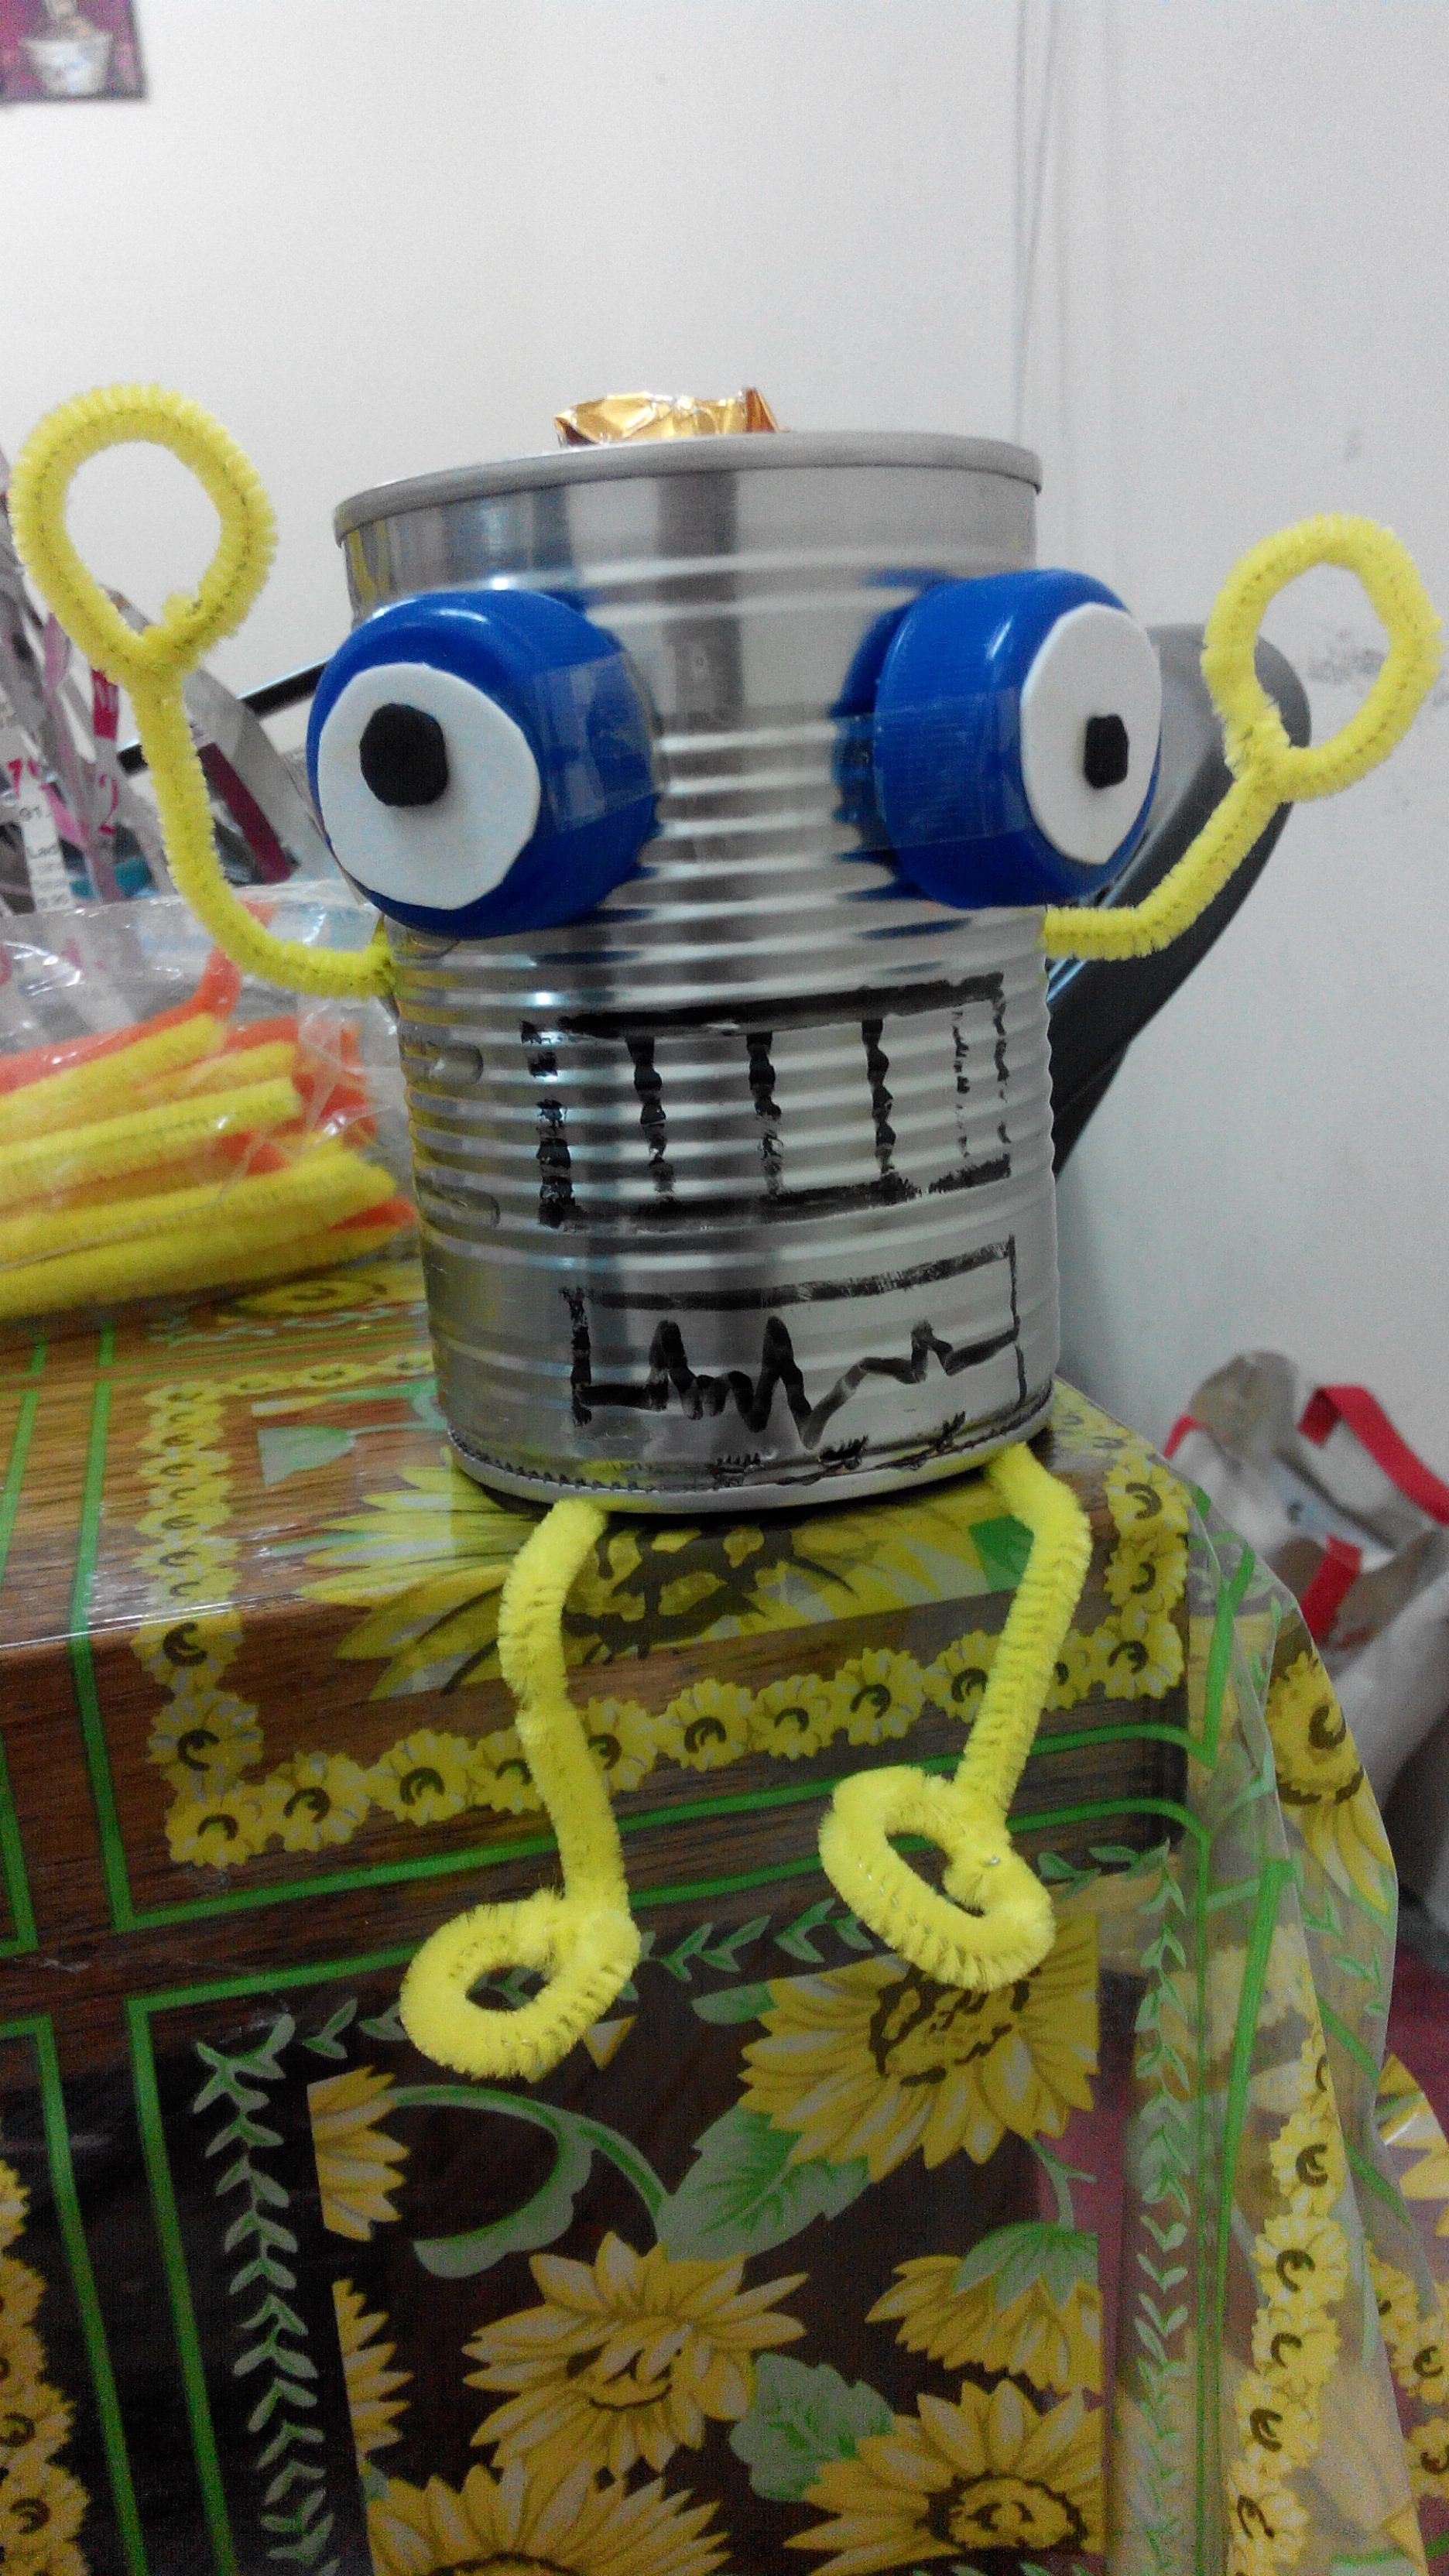 Binaan Robot Daripada Bahan Terbuang Tin Susu Kosong Penutup Plastik Botol Dawai